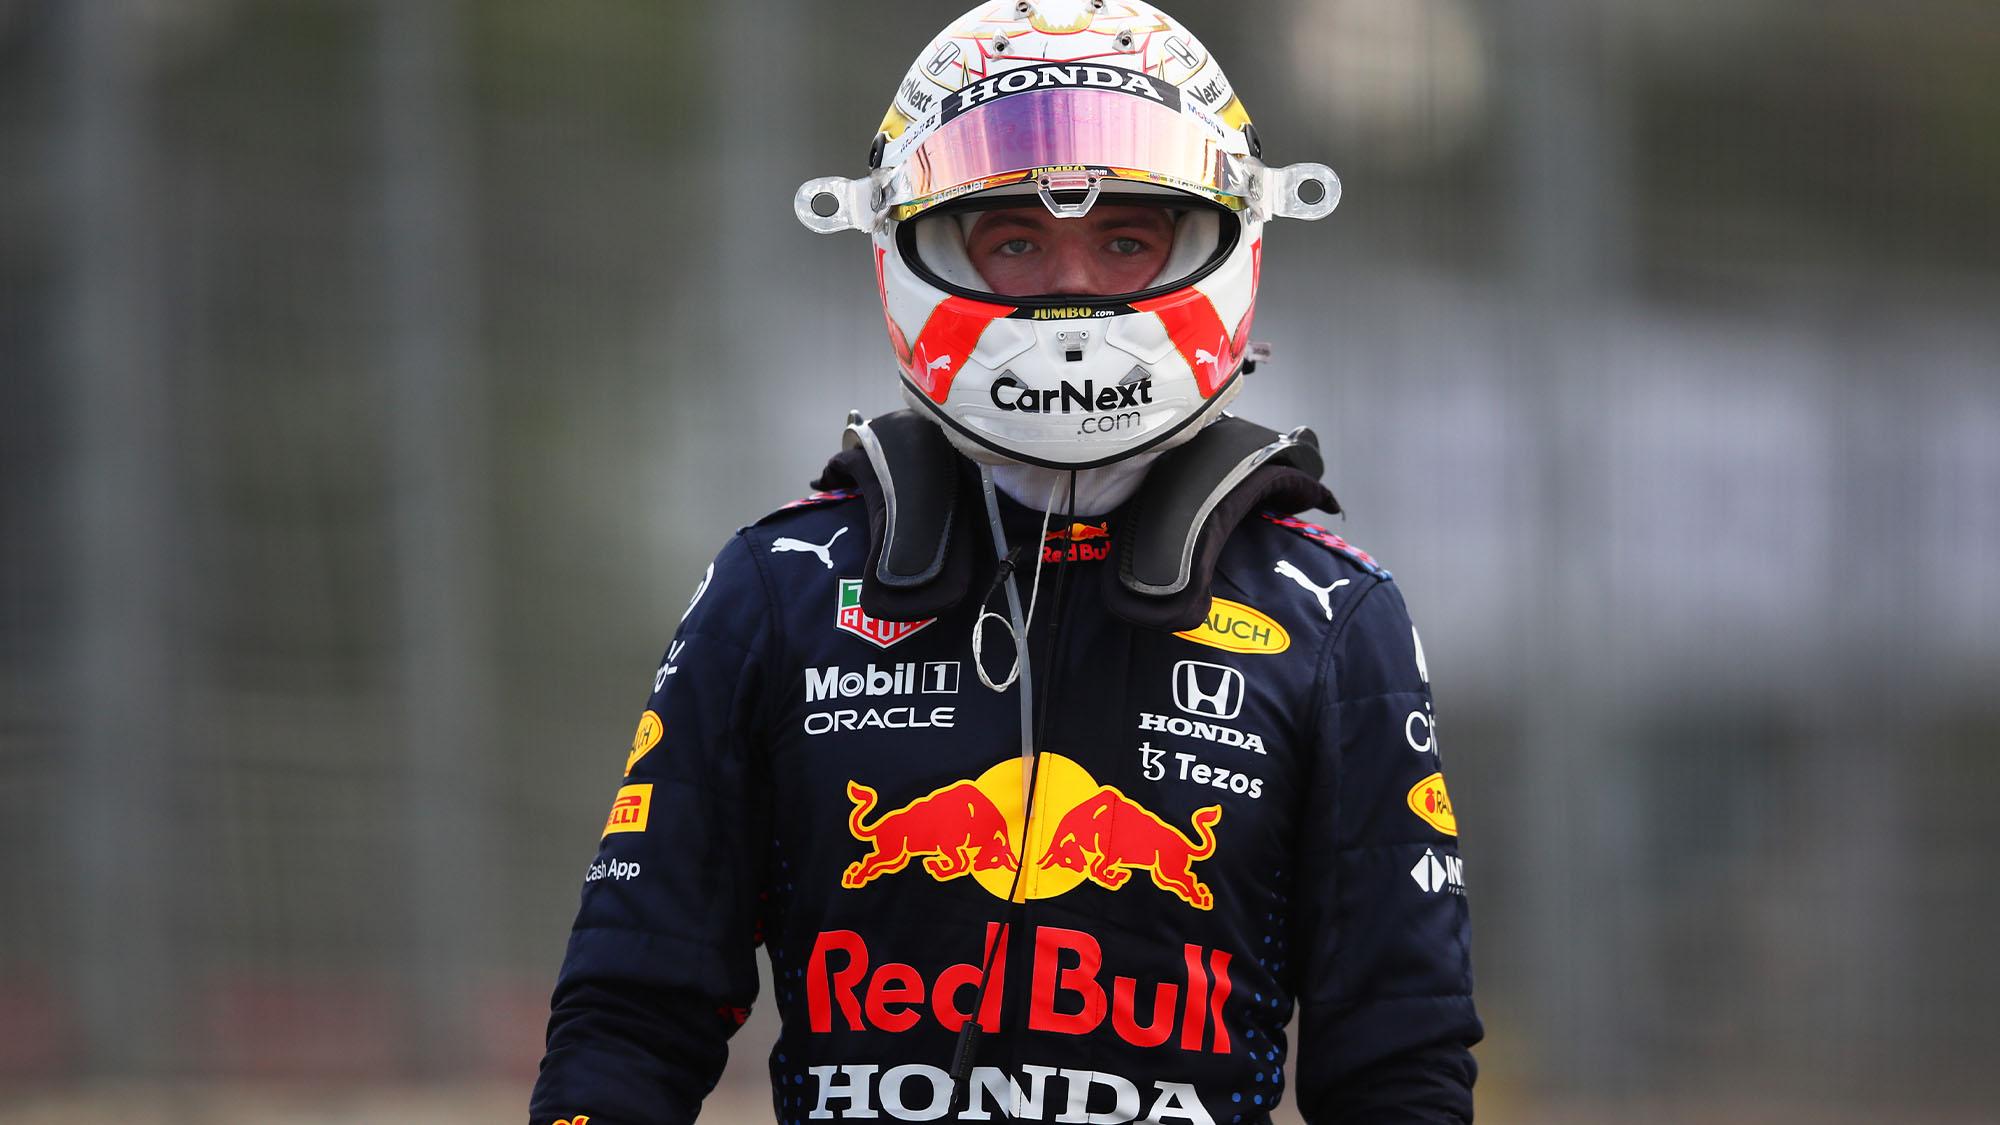 BAKU, AZERBAIJAN - JUNE 06: Max Verstappen of Netherlands and Red Bull Racing looks on as he walks back to the garage after a crash during the F1 Grand Prix of Azerbaijan at Baku City Circuit on June 06, 2021 in Baku, Azerbaijan. (Photo by Joe Portlock - Formula 1/Formula 1 via Getty Images)